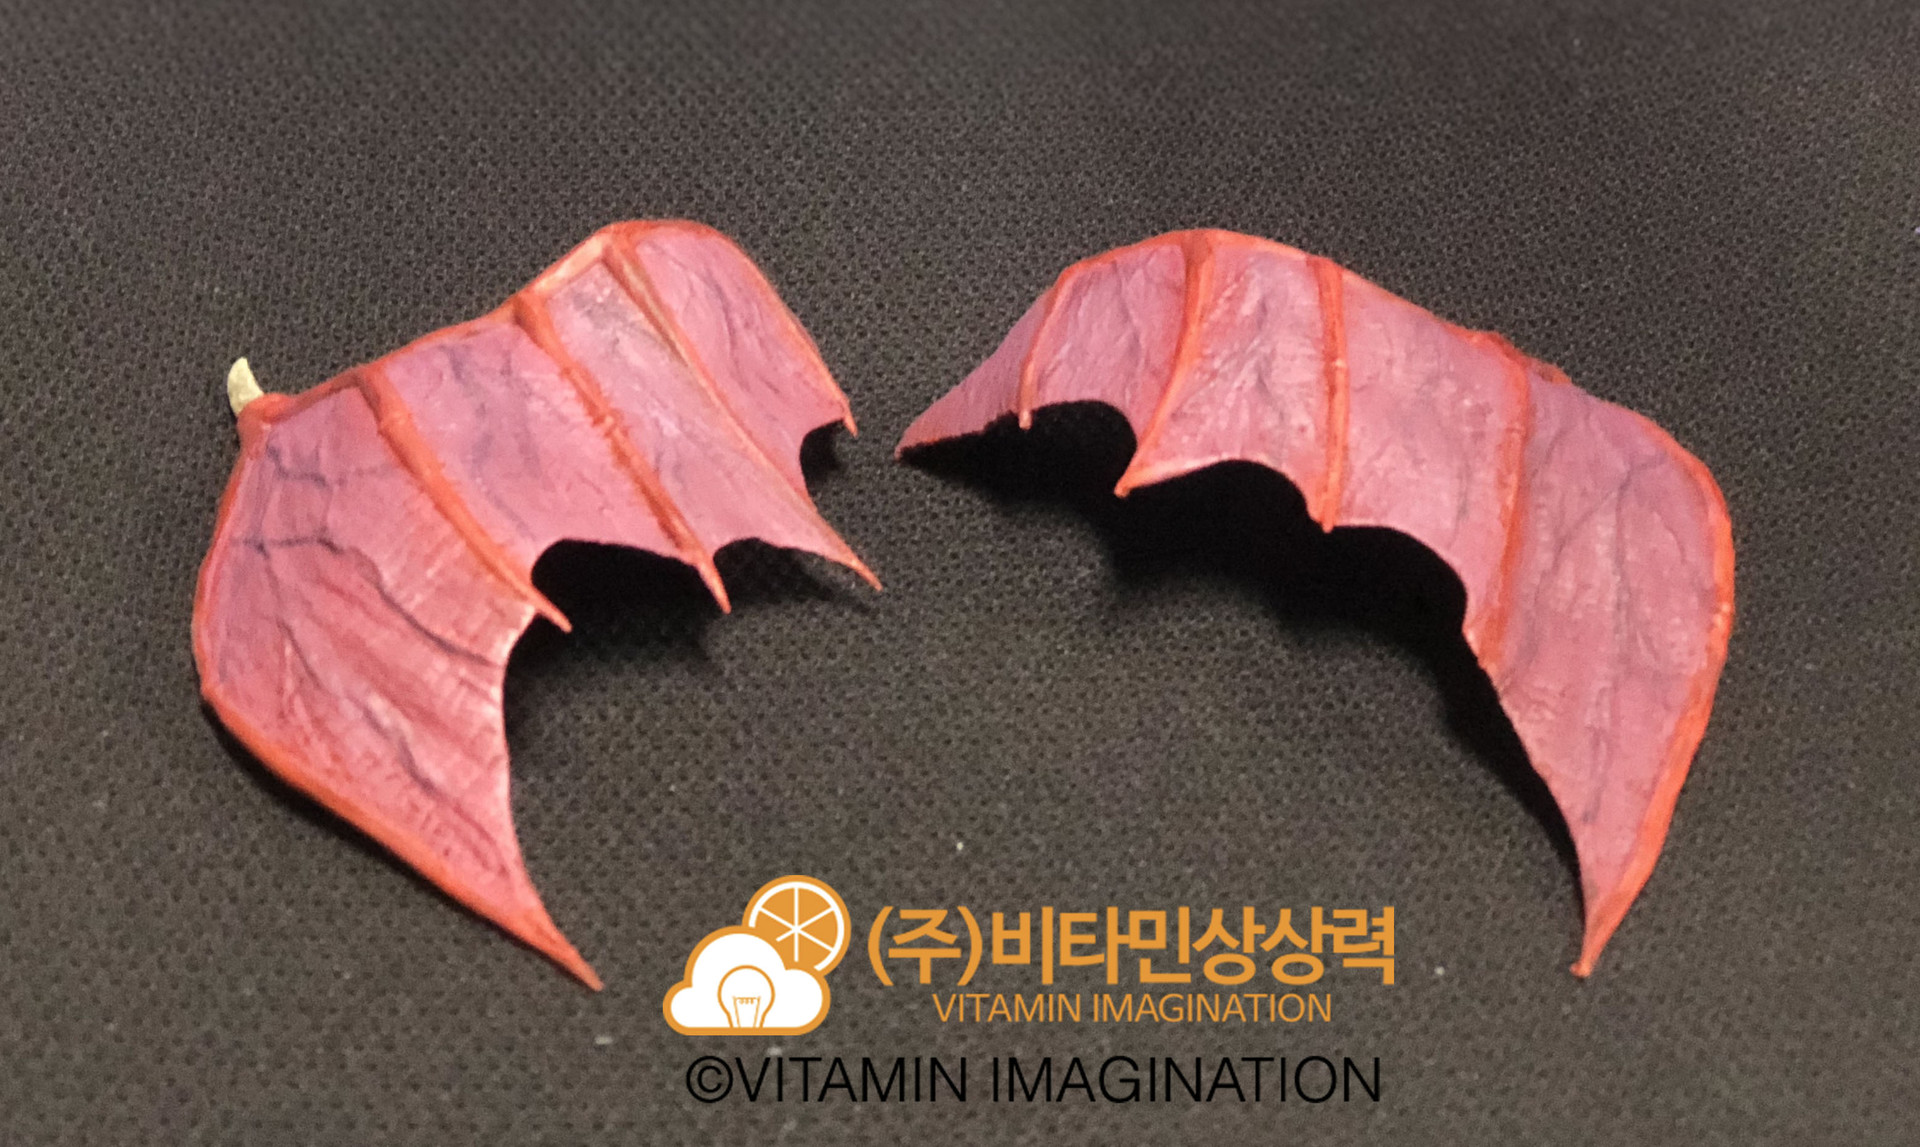 Vitamin imagination 77